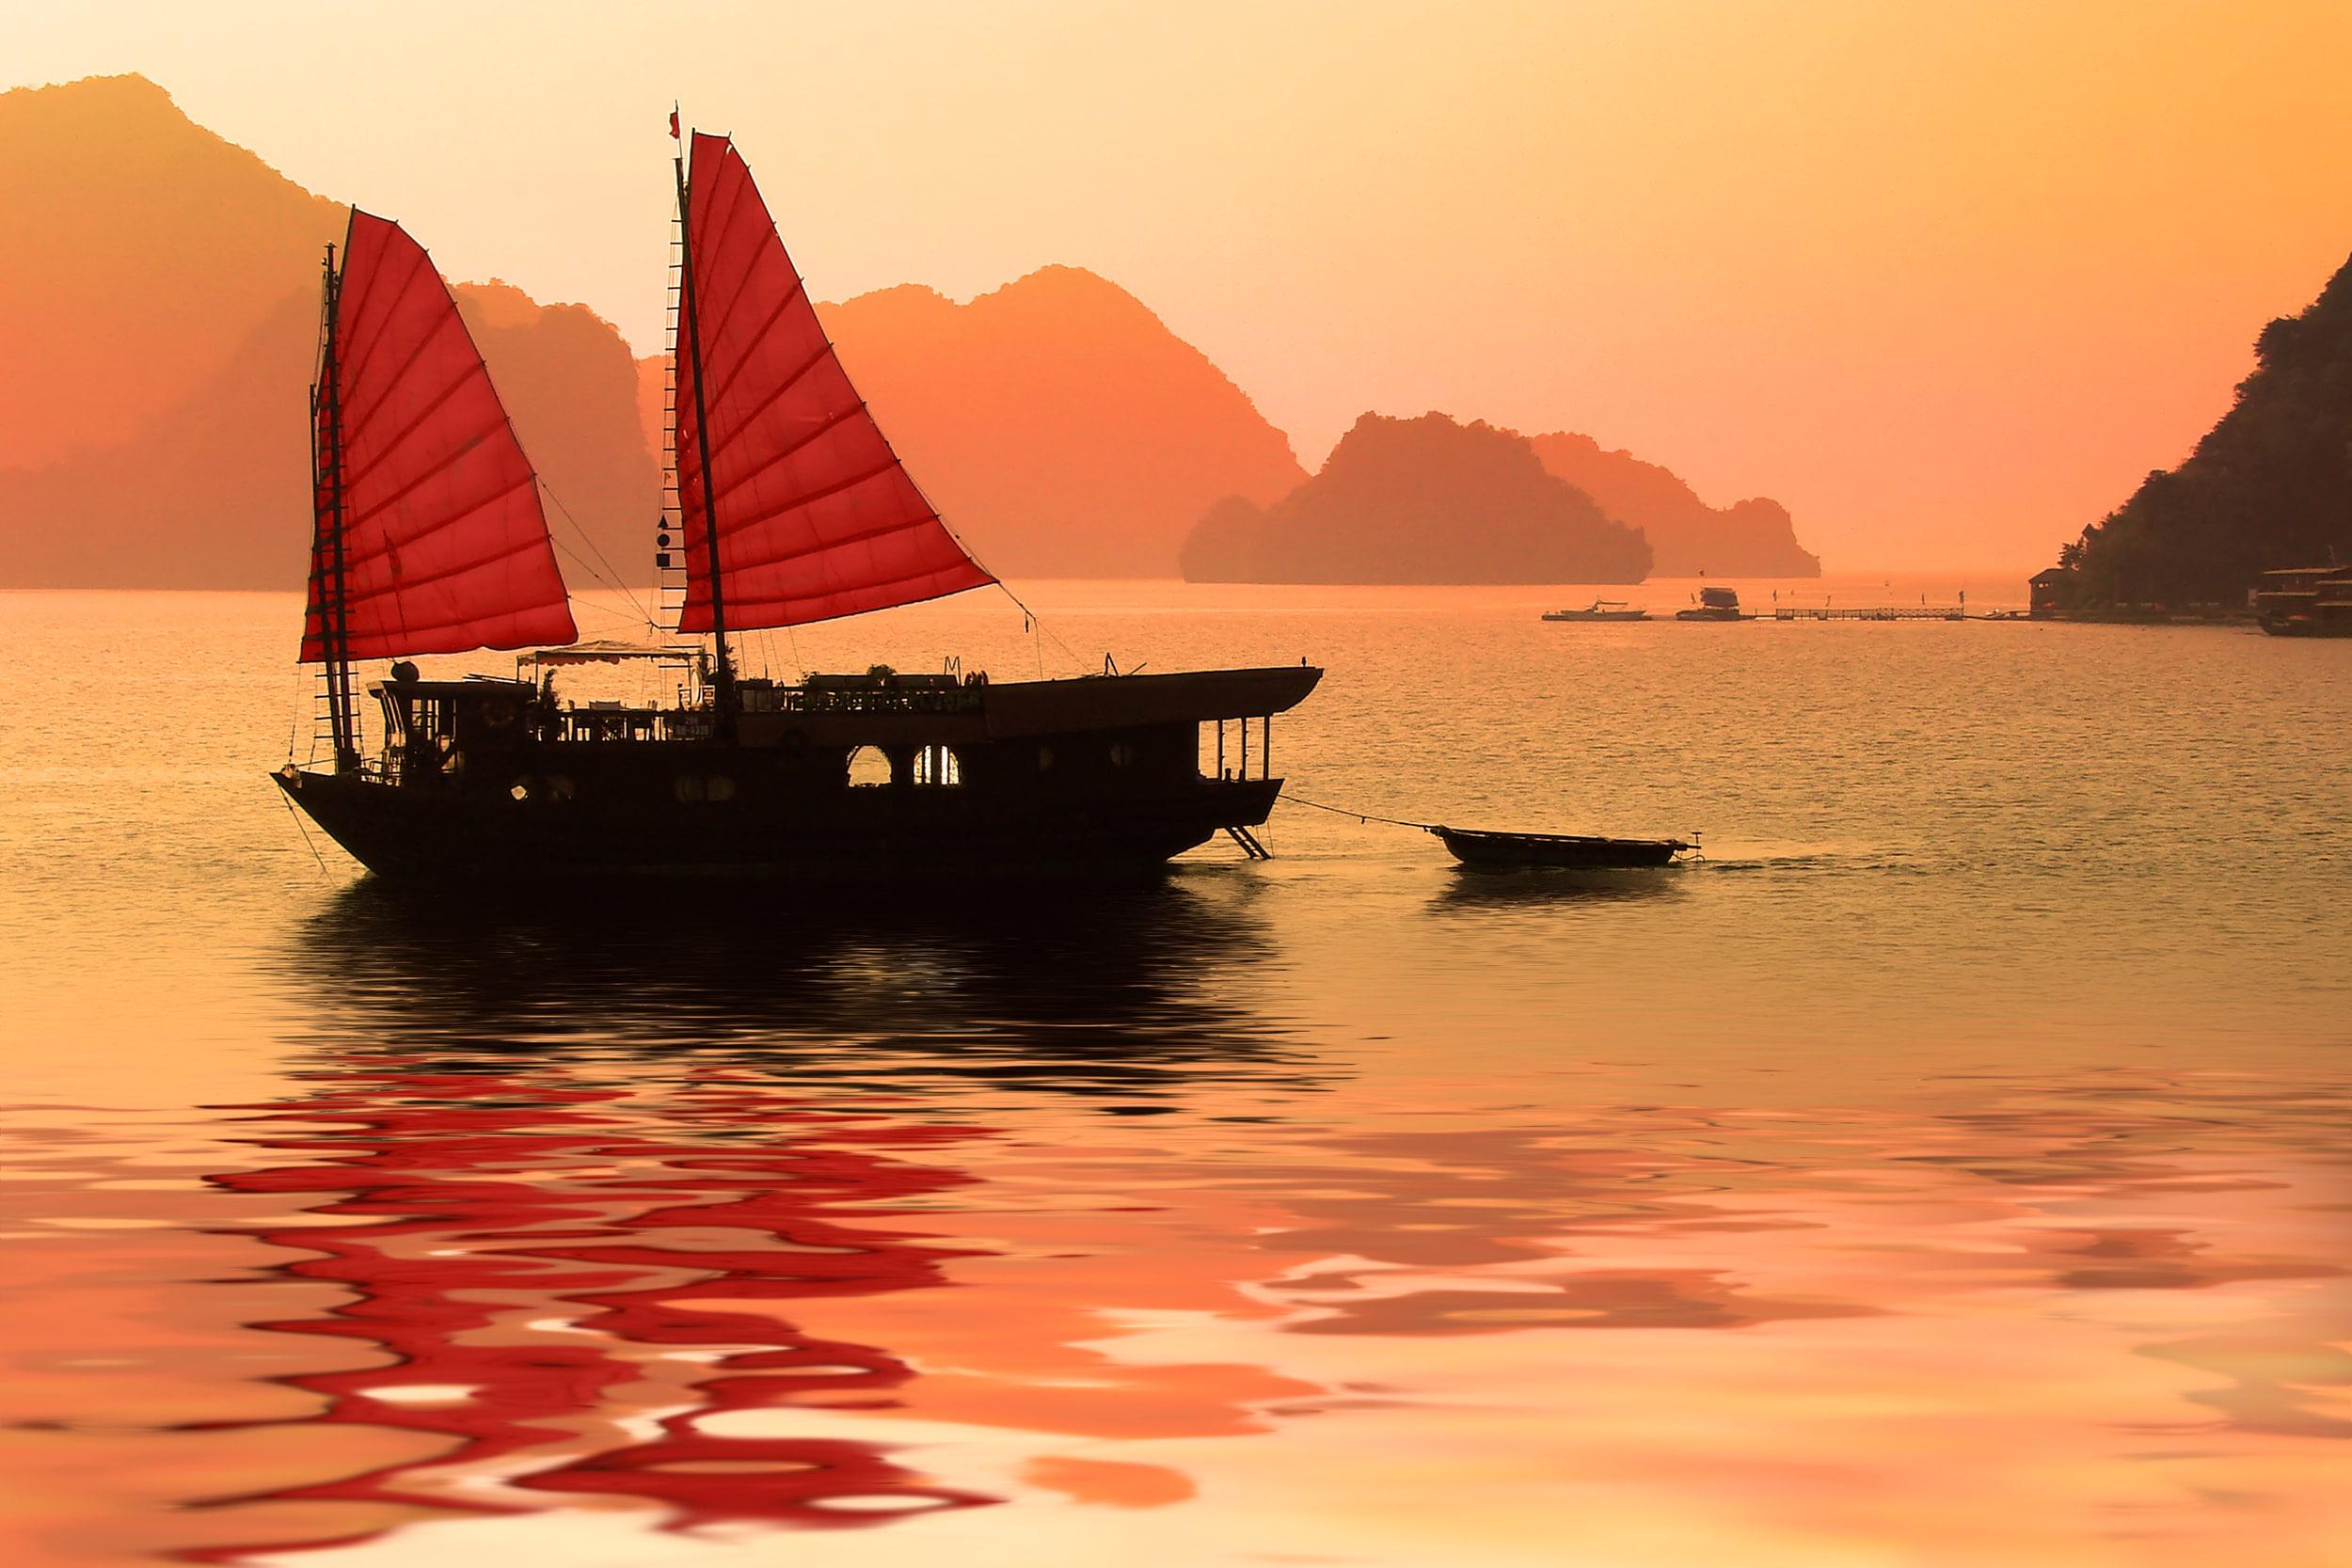 Junk boat at sunset in Halong Bay, Vietnam